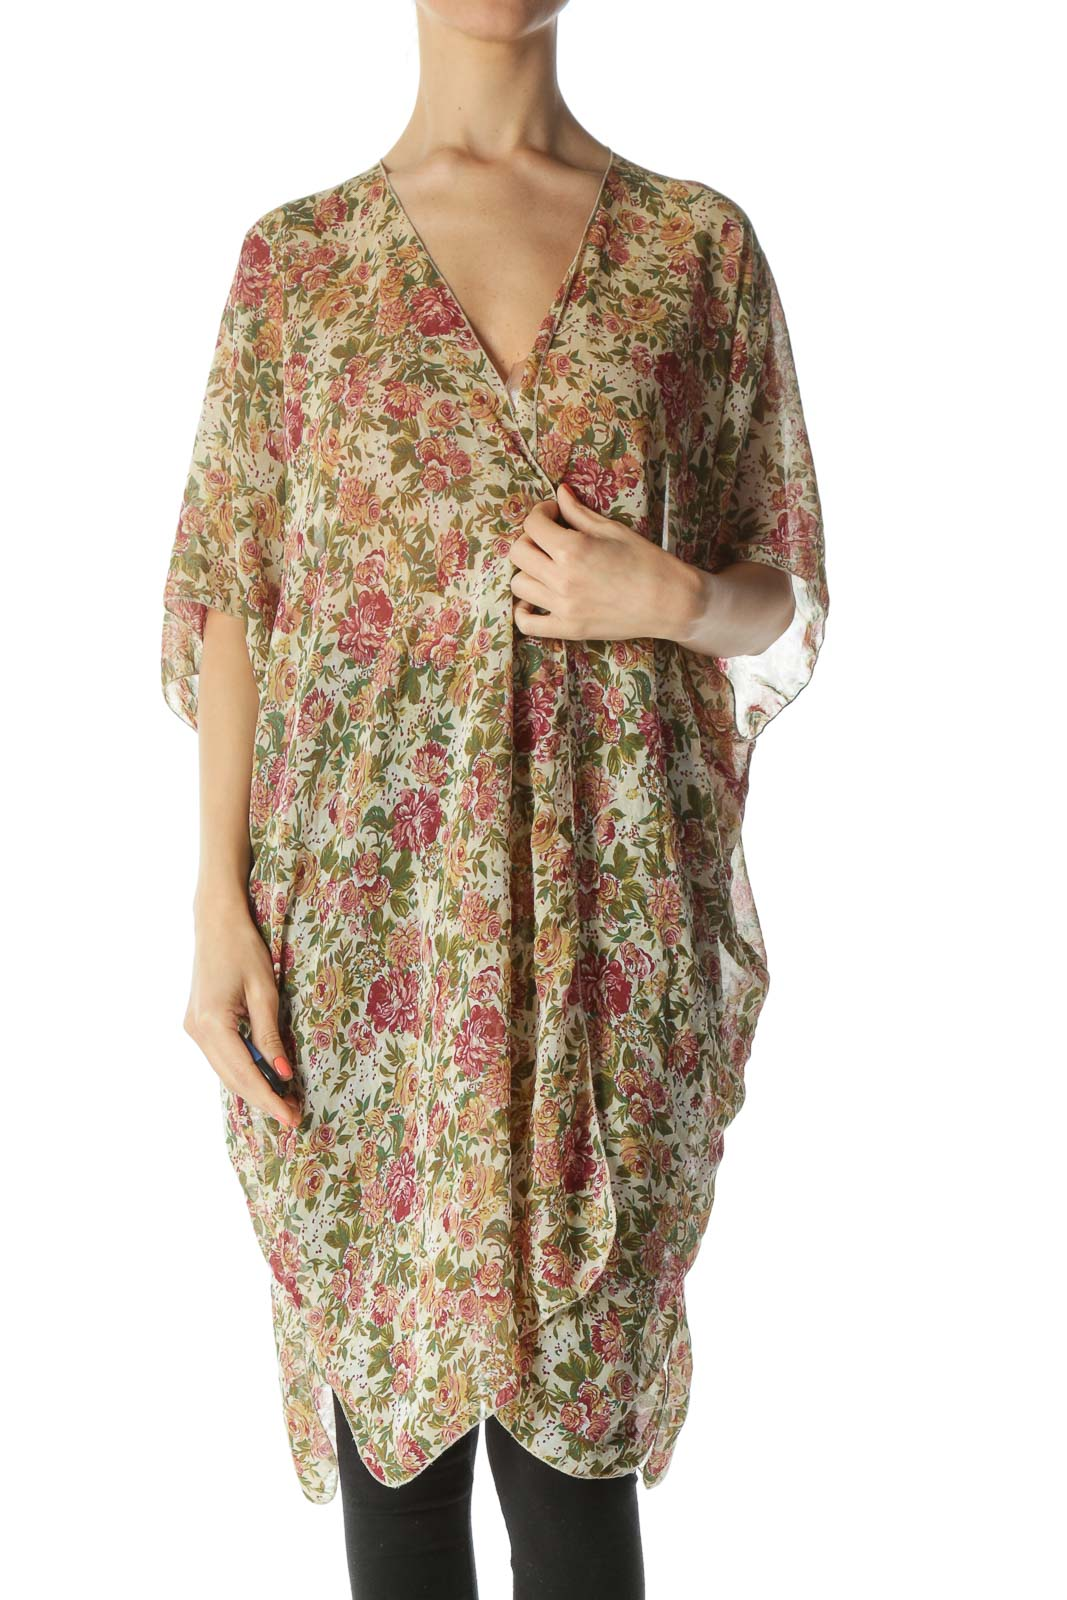 Burgundy/Green/Beige Floral-Print Light-Weight Cardigan